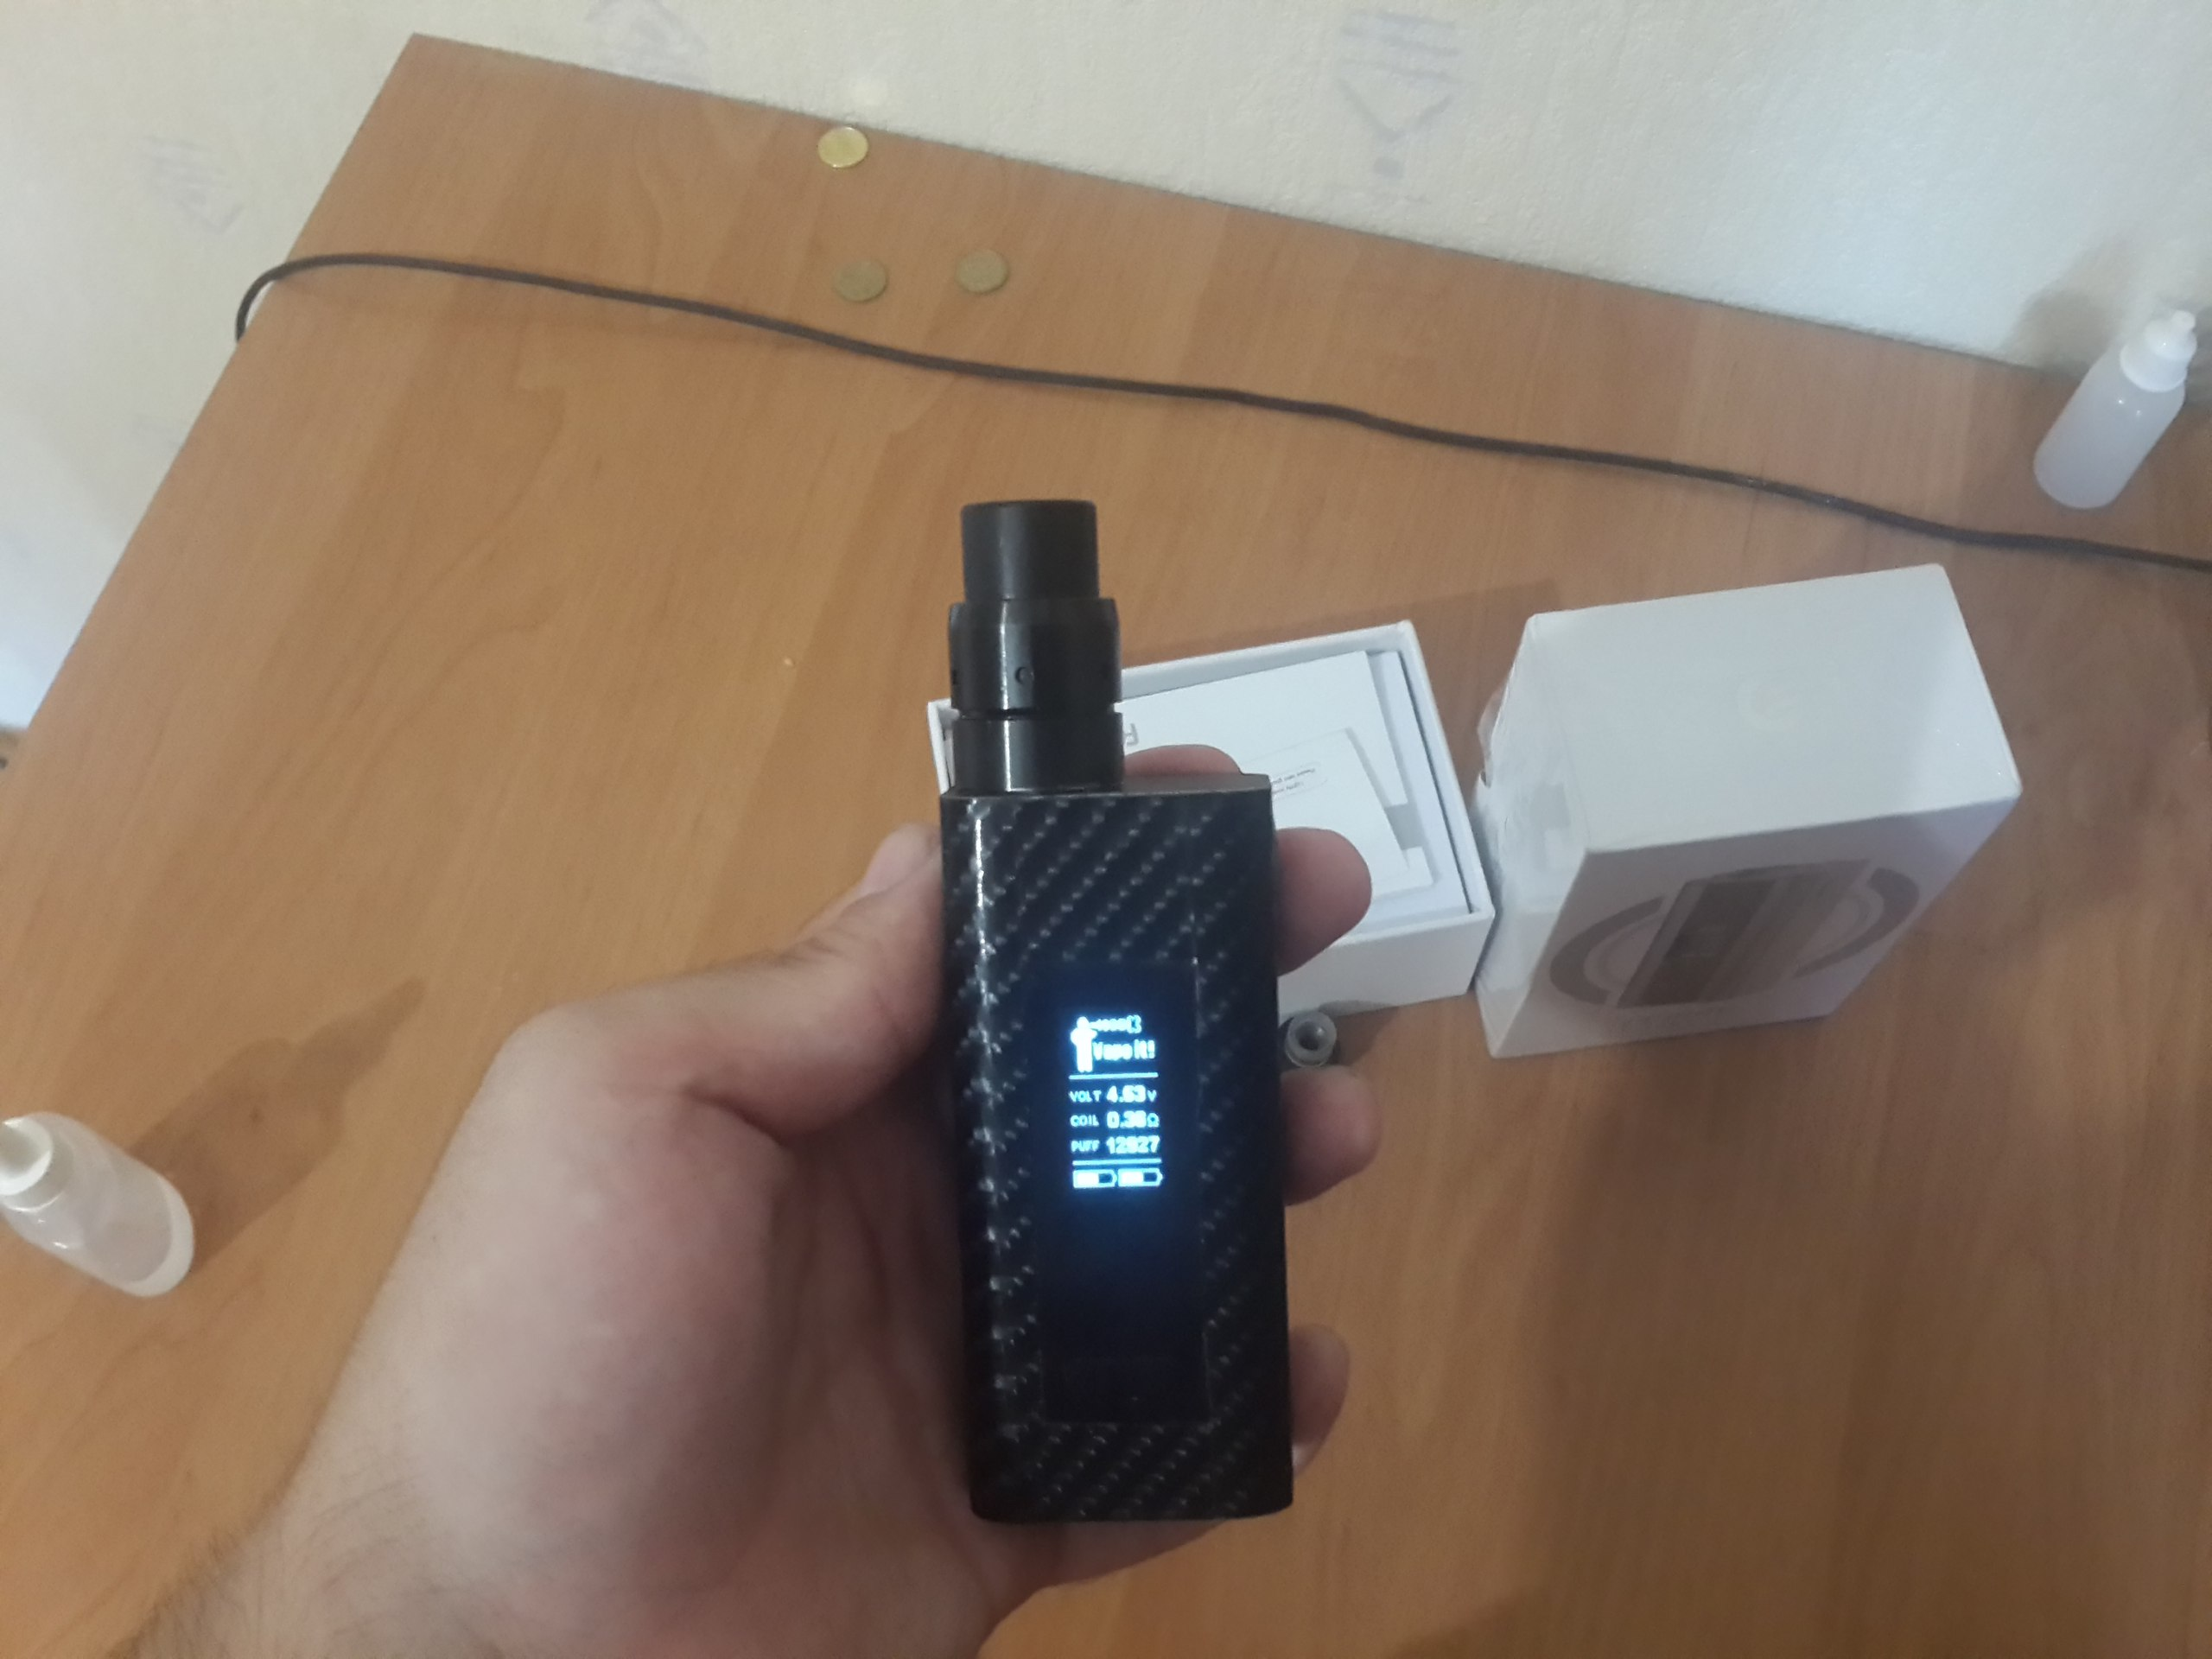 Продам Cuboid 150(200) Ватт с батарейками, Velocity RDA, subtank mini with bell cap 086